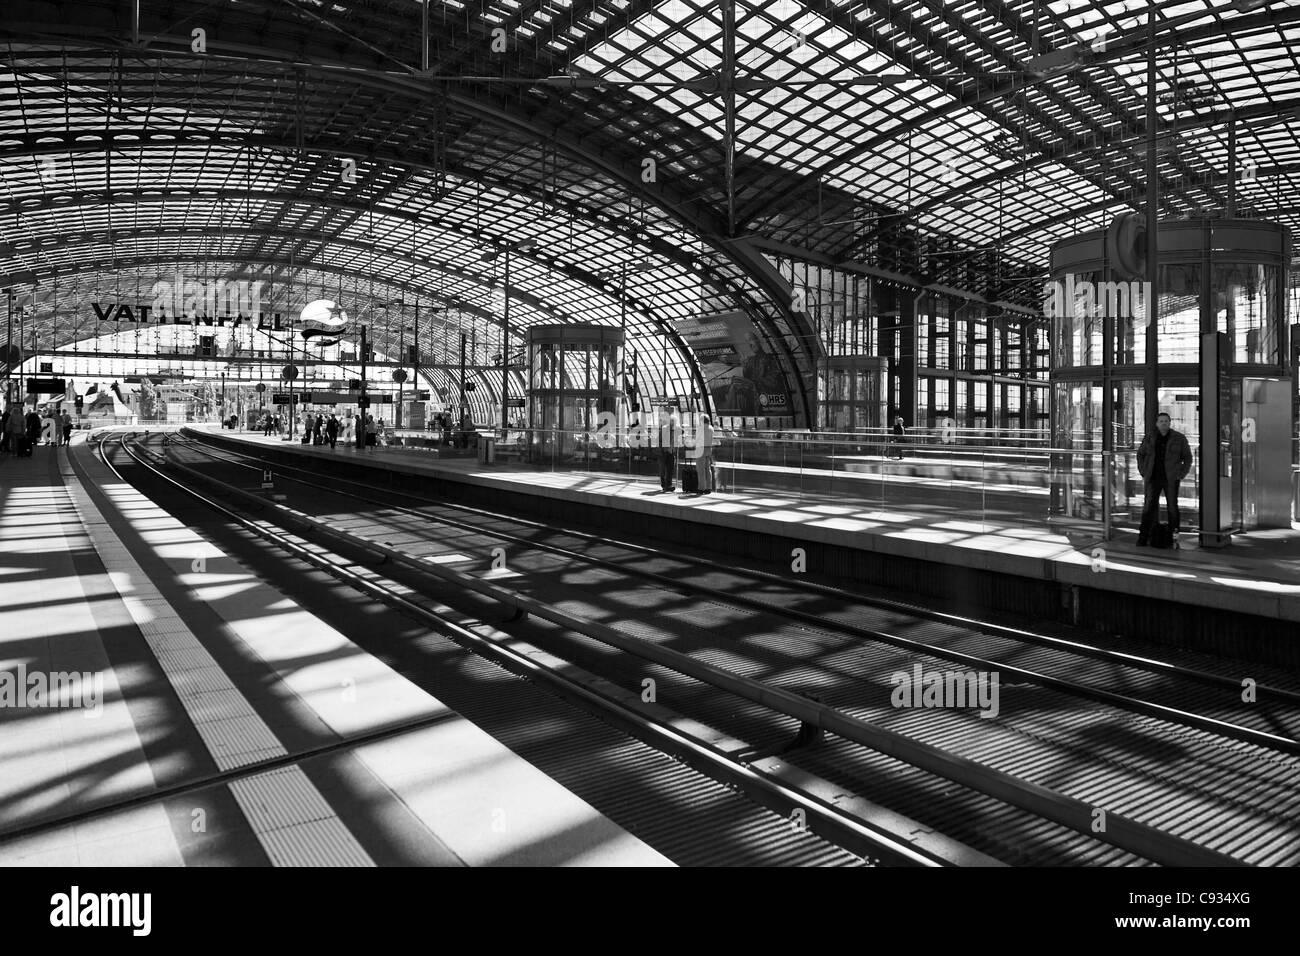 Railway tracks, platform and glass barrel vault roof of the Berlin Main Railway Station, Berlin, Germany. - Stock Image